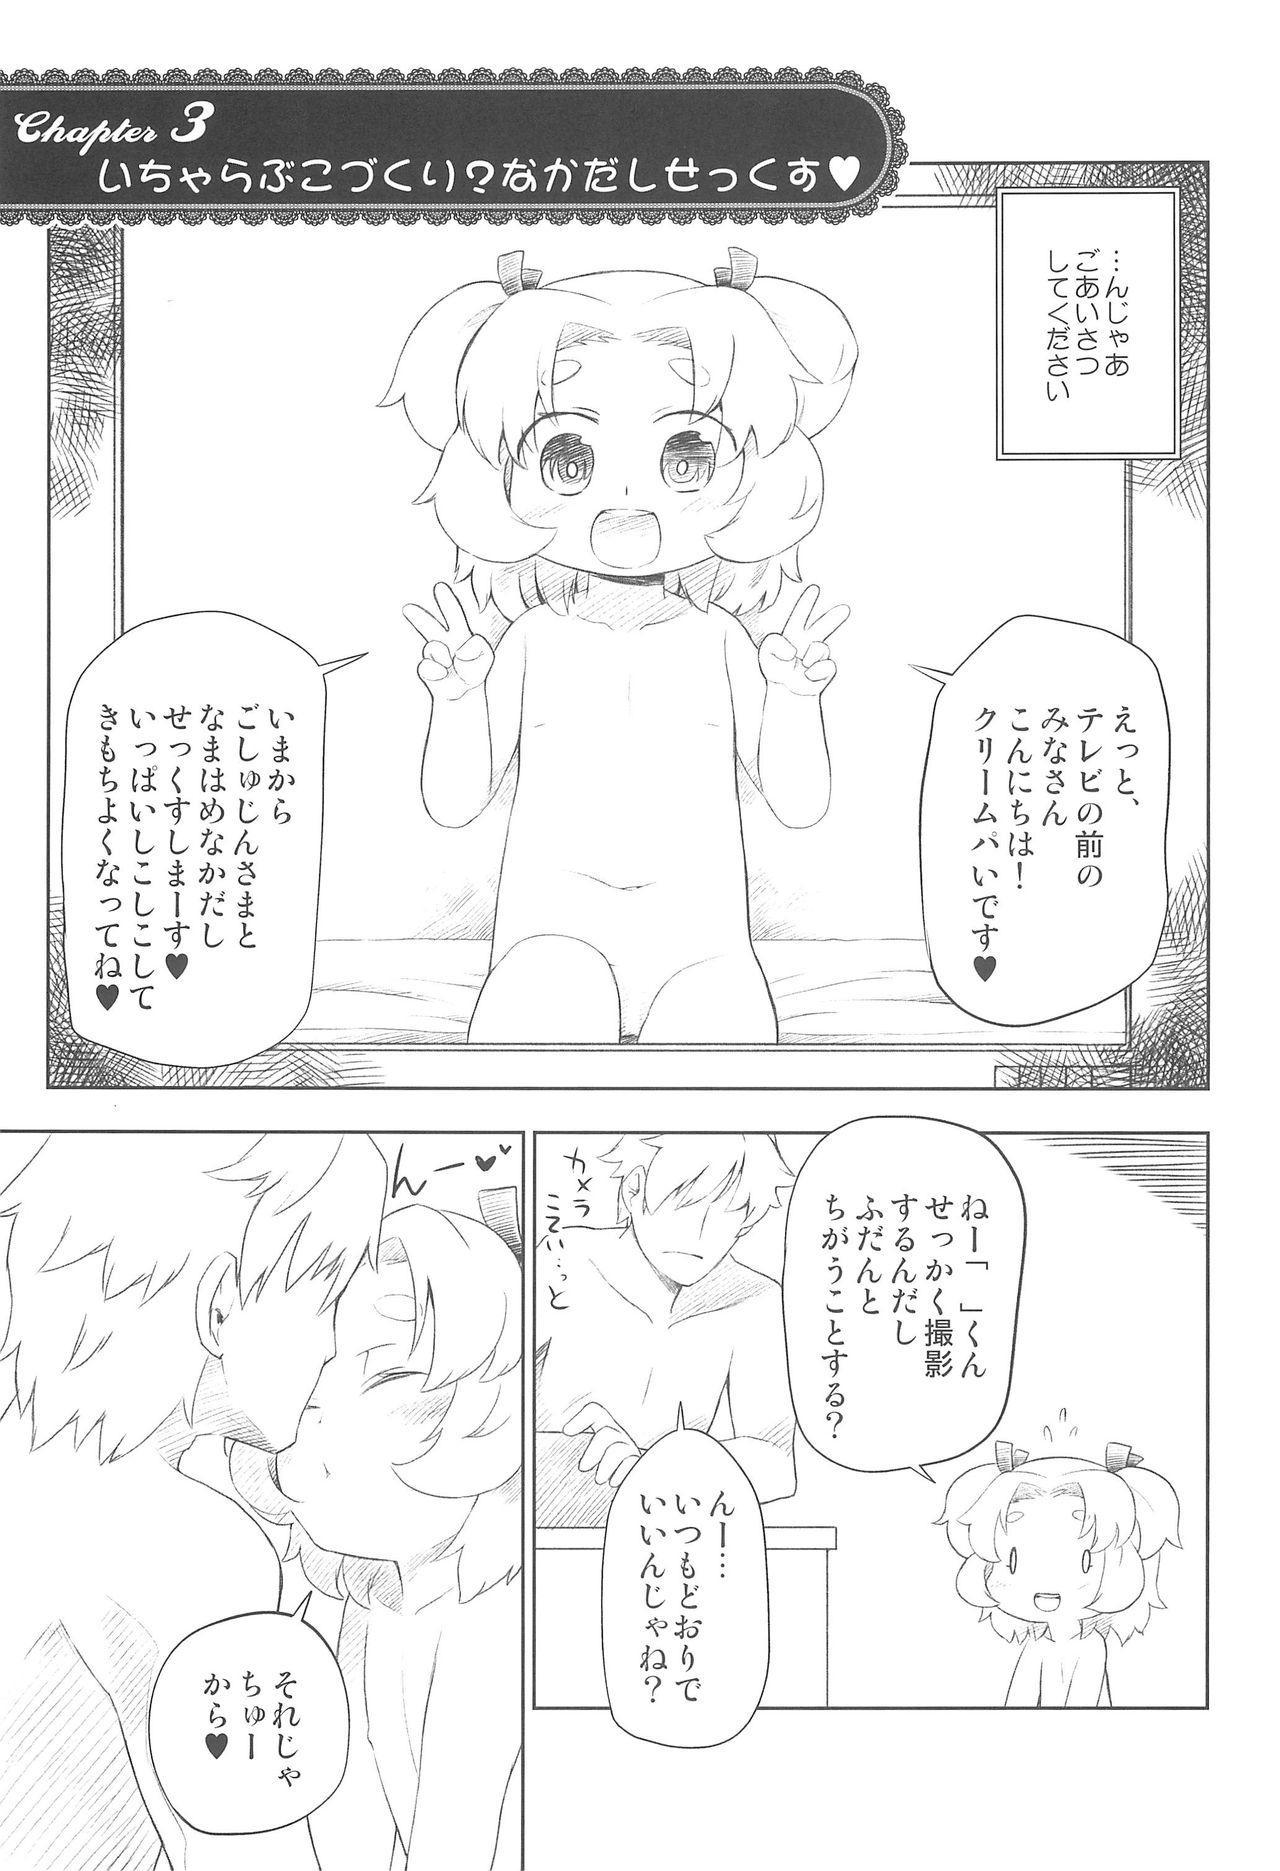 Petit Dolls VOL. 9 Creampie-san Torotoro Amaai Nakadashi Girl 10